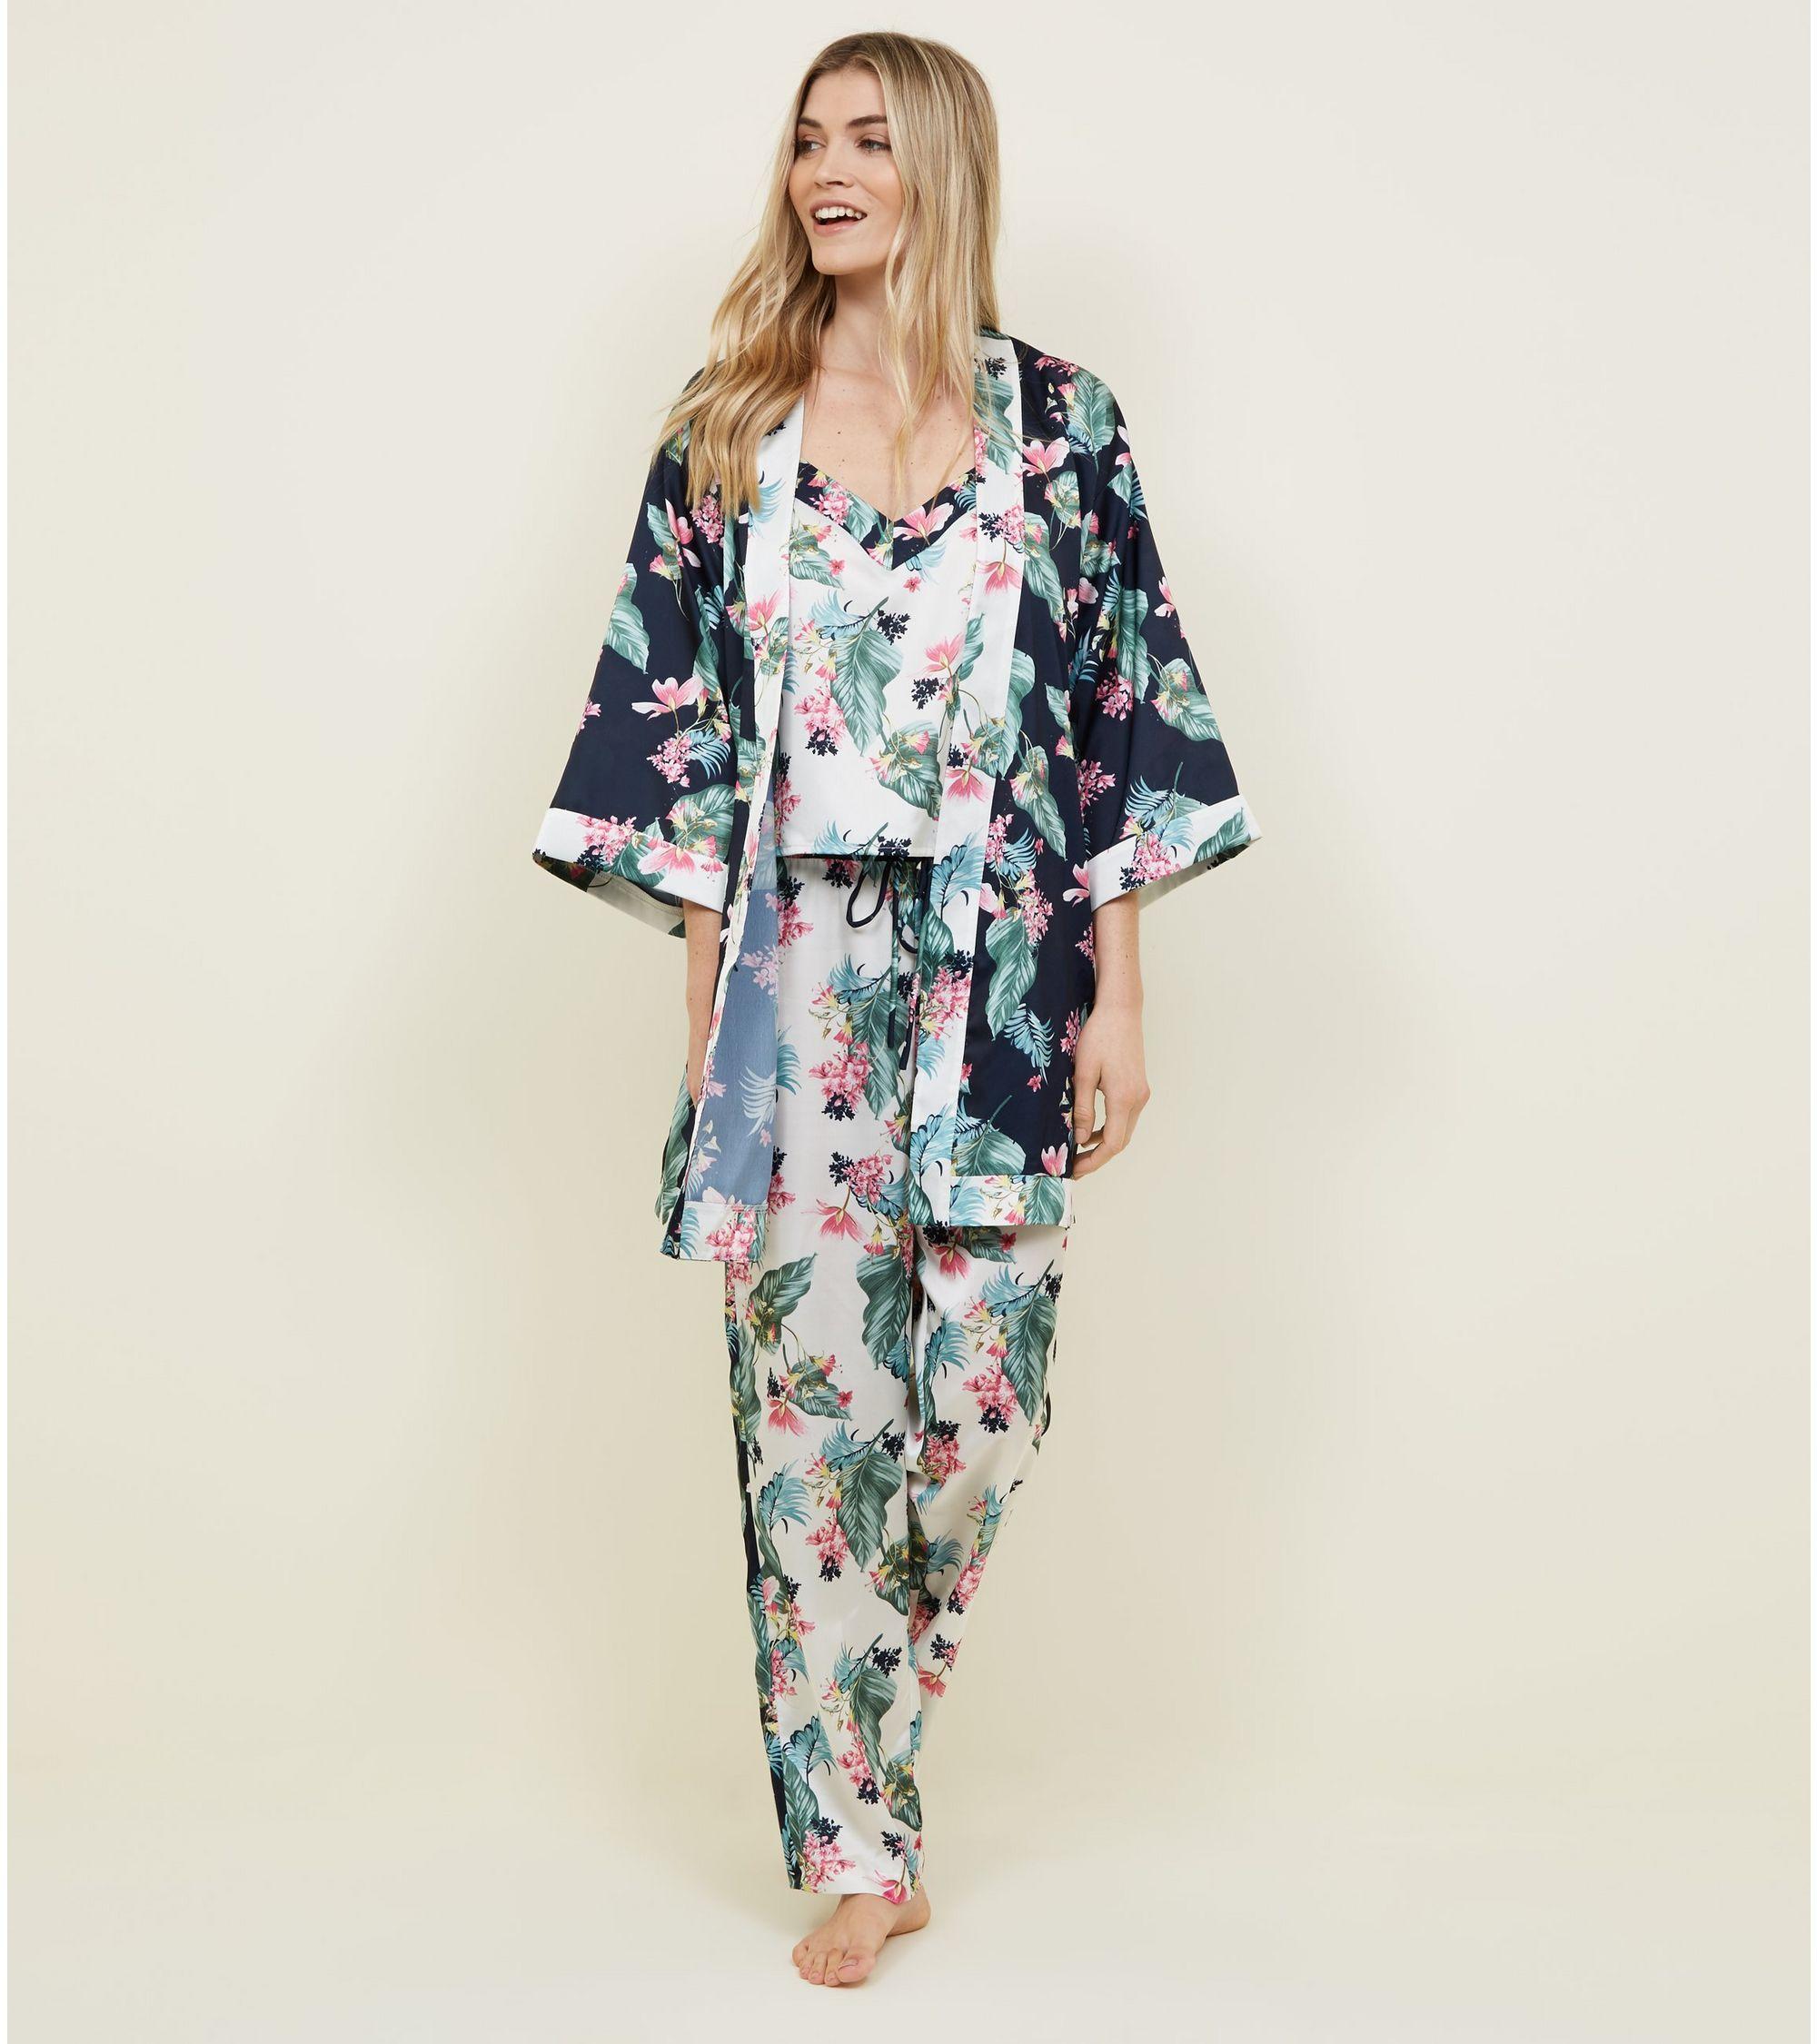 da8c744609 New Look Soraya Blue Floral Leaf Print Satin Robe at £22.99